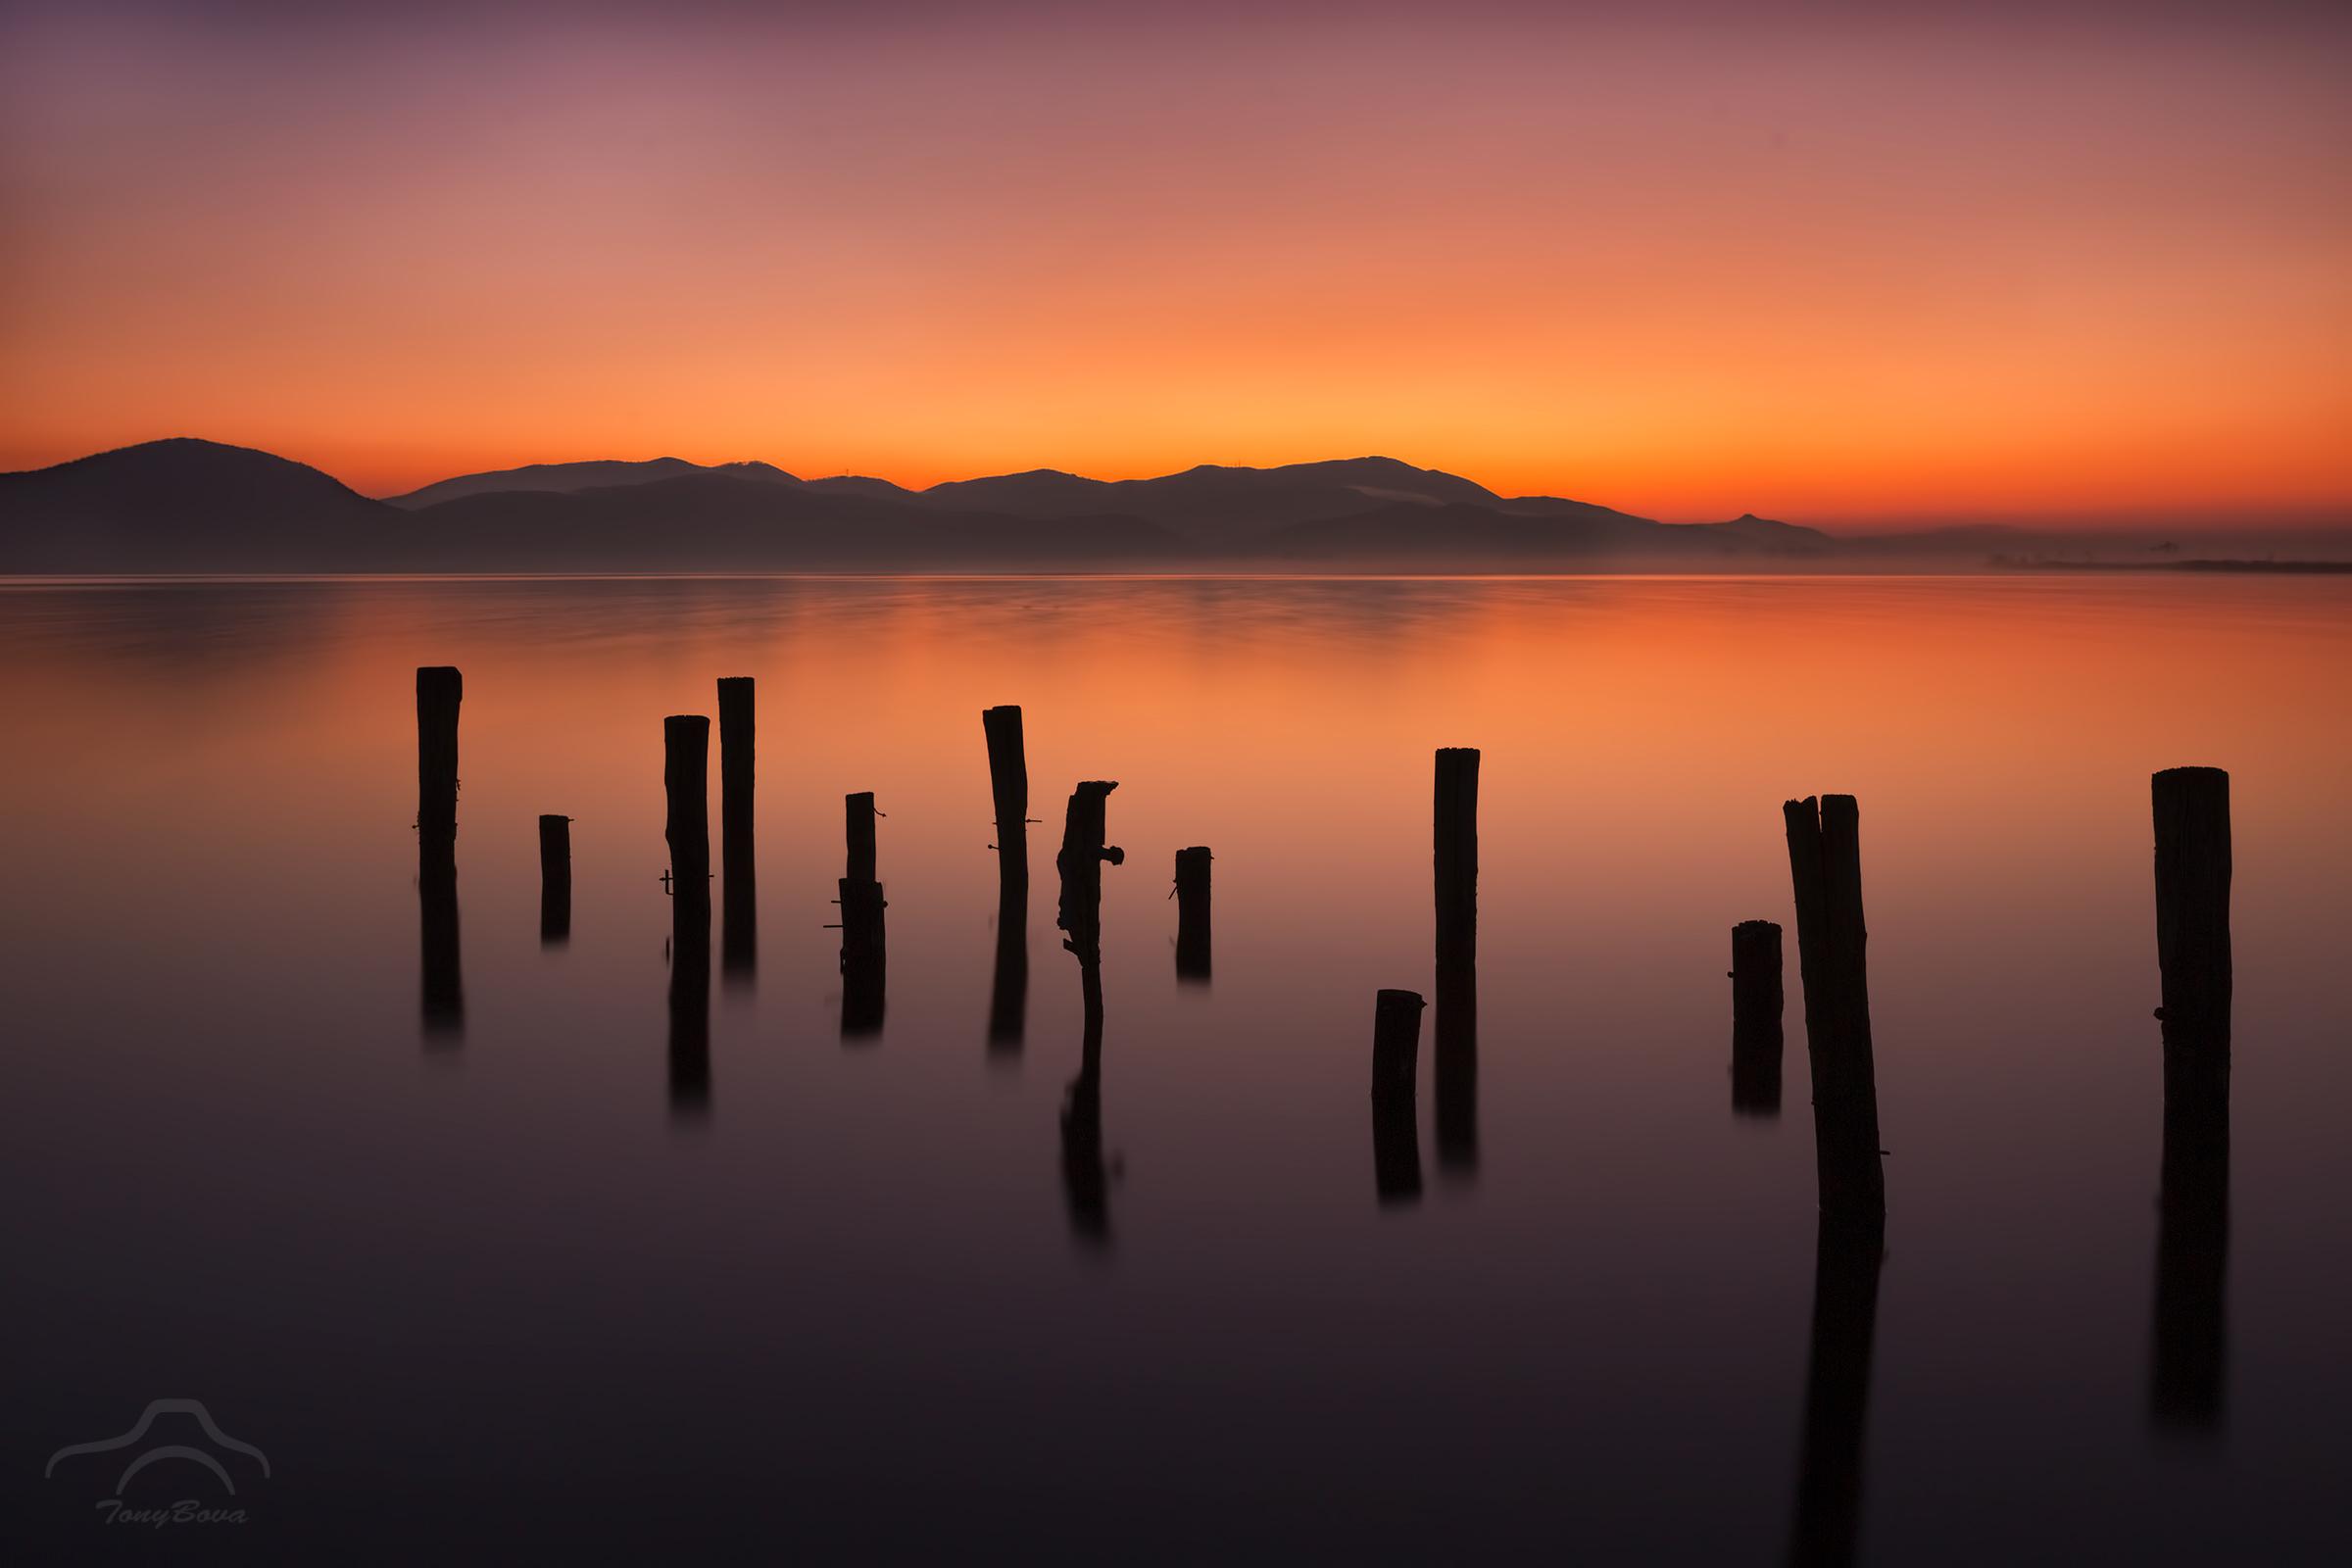 A sunrise at Torre del Lago ......